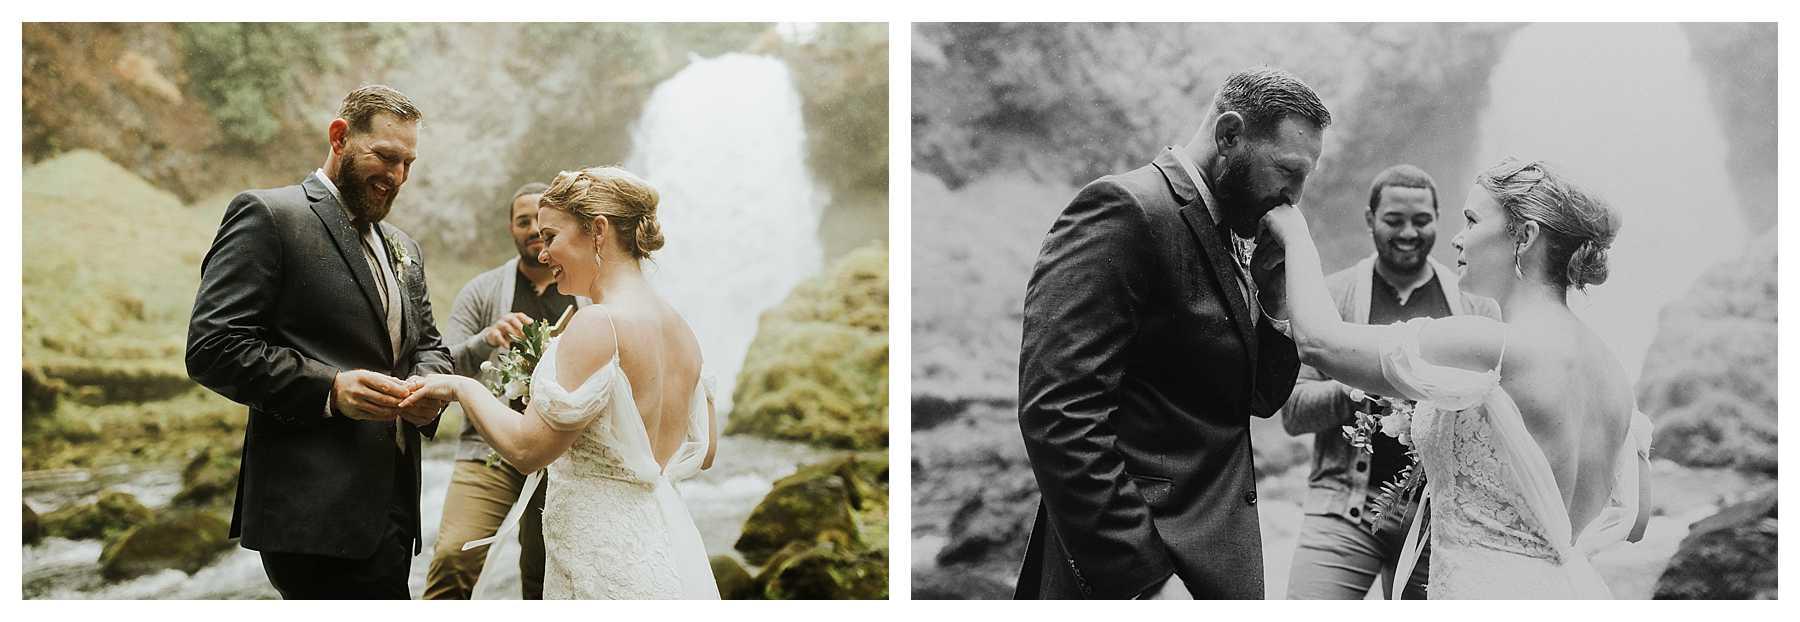 Oregon_Waterfall_Elopement_0022.jpg